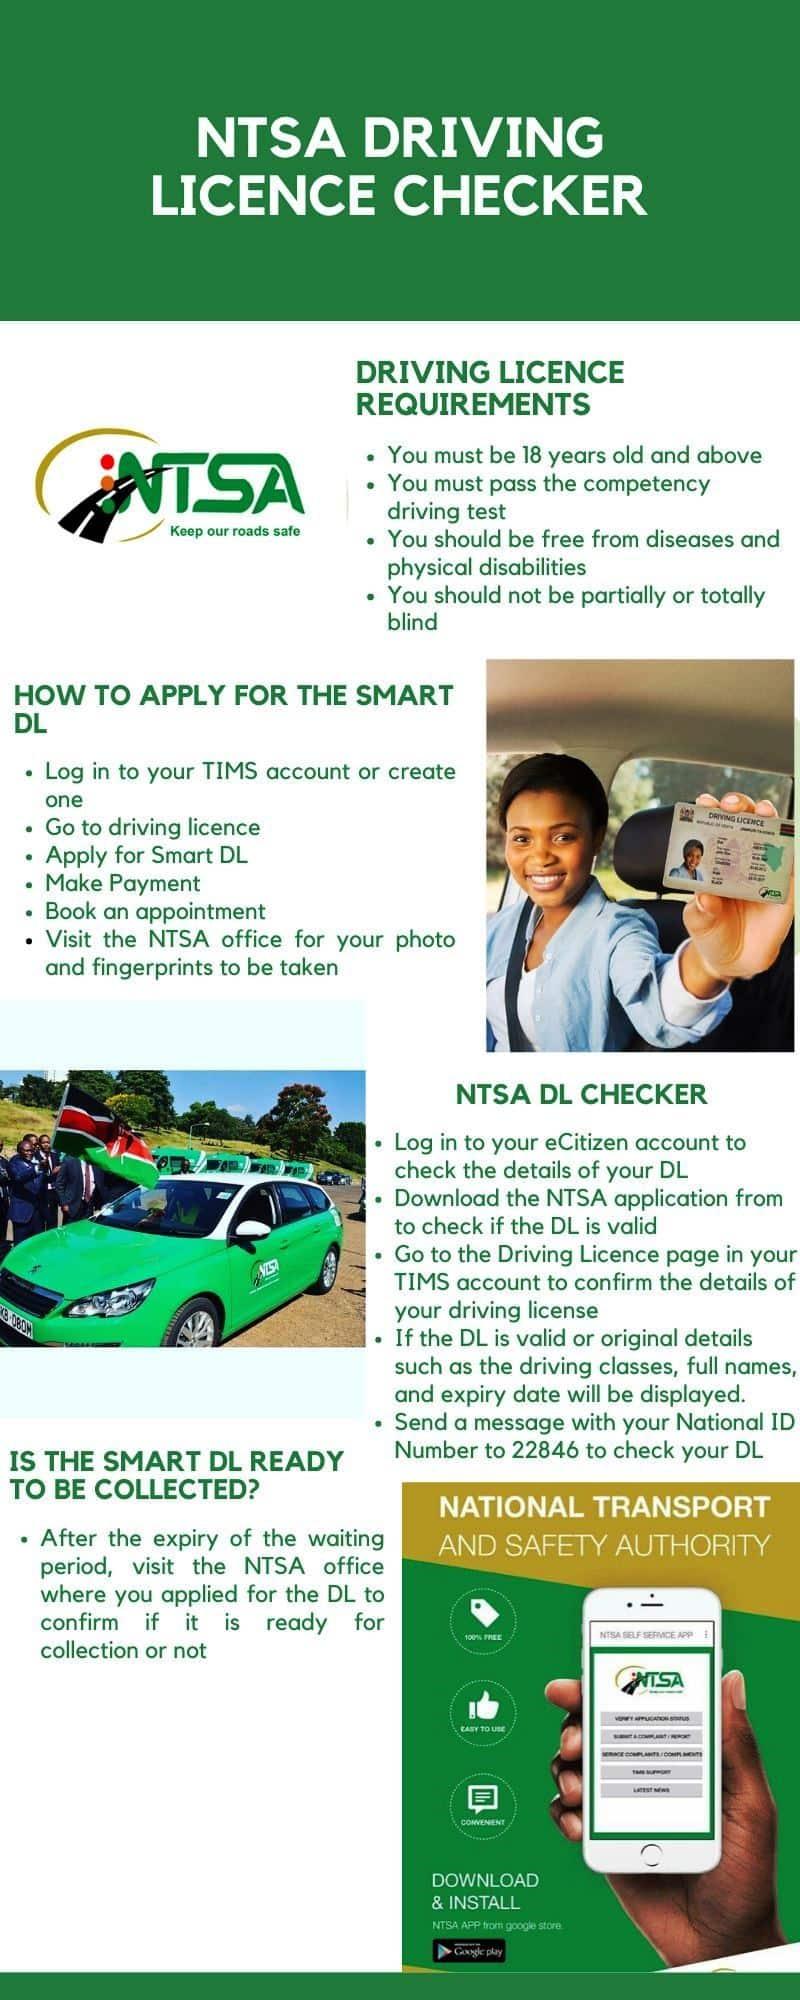 NTSA driving licence checker